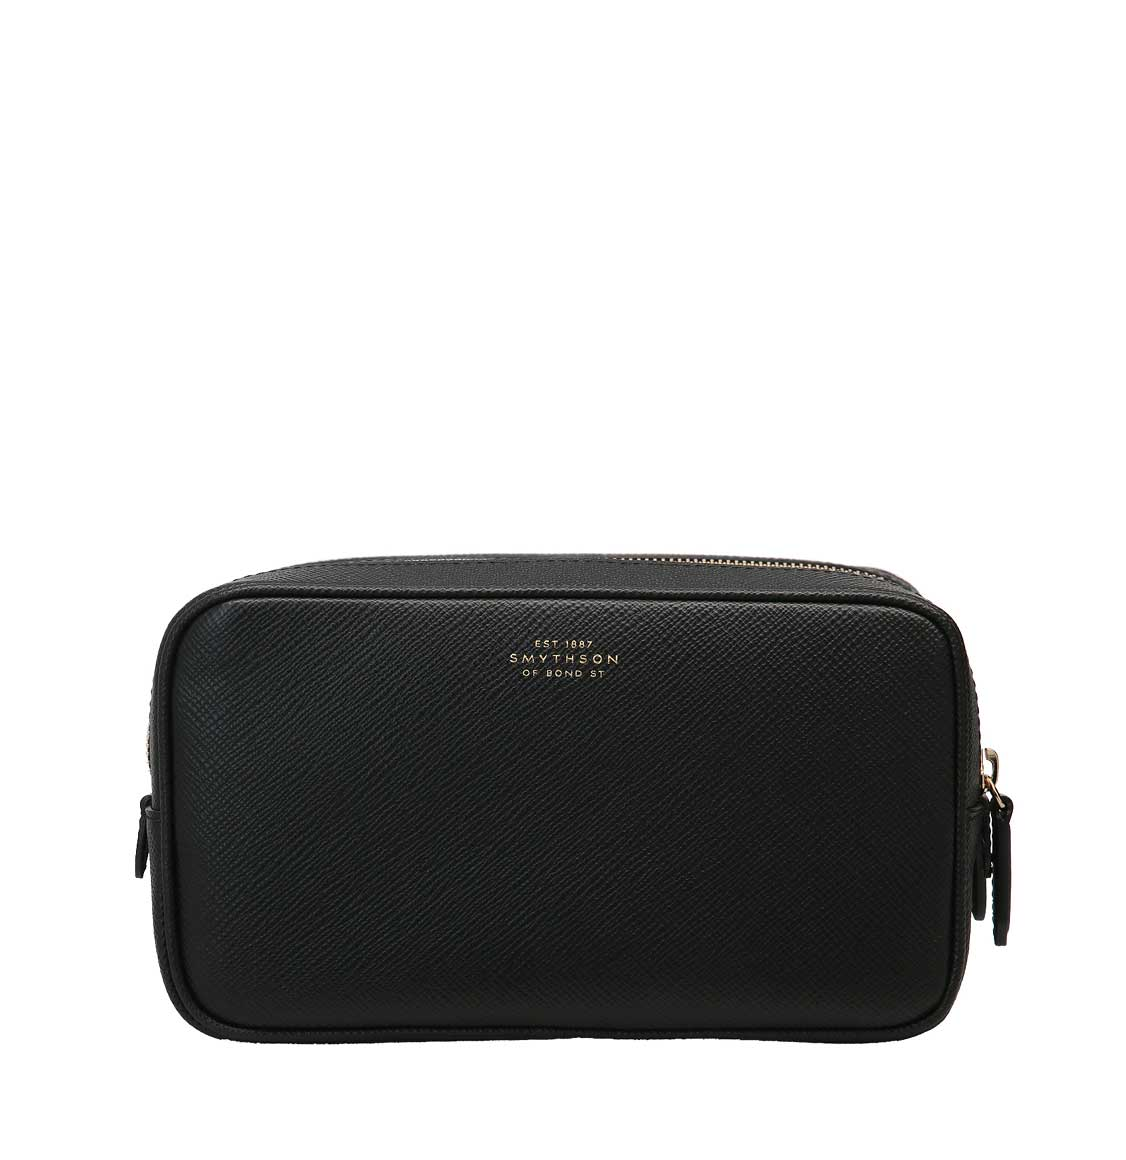 Smythson Panama Cross-Grain Leather Wash Bag Black